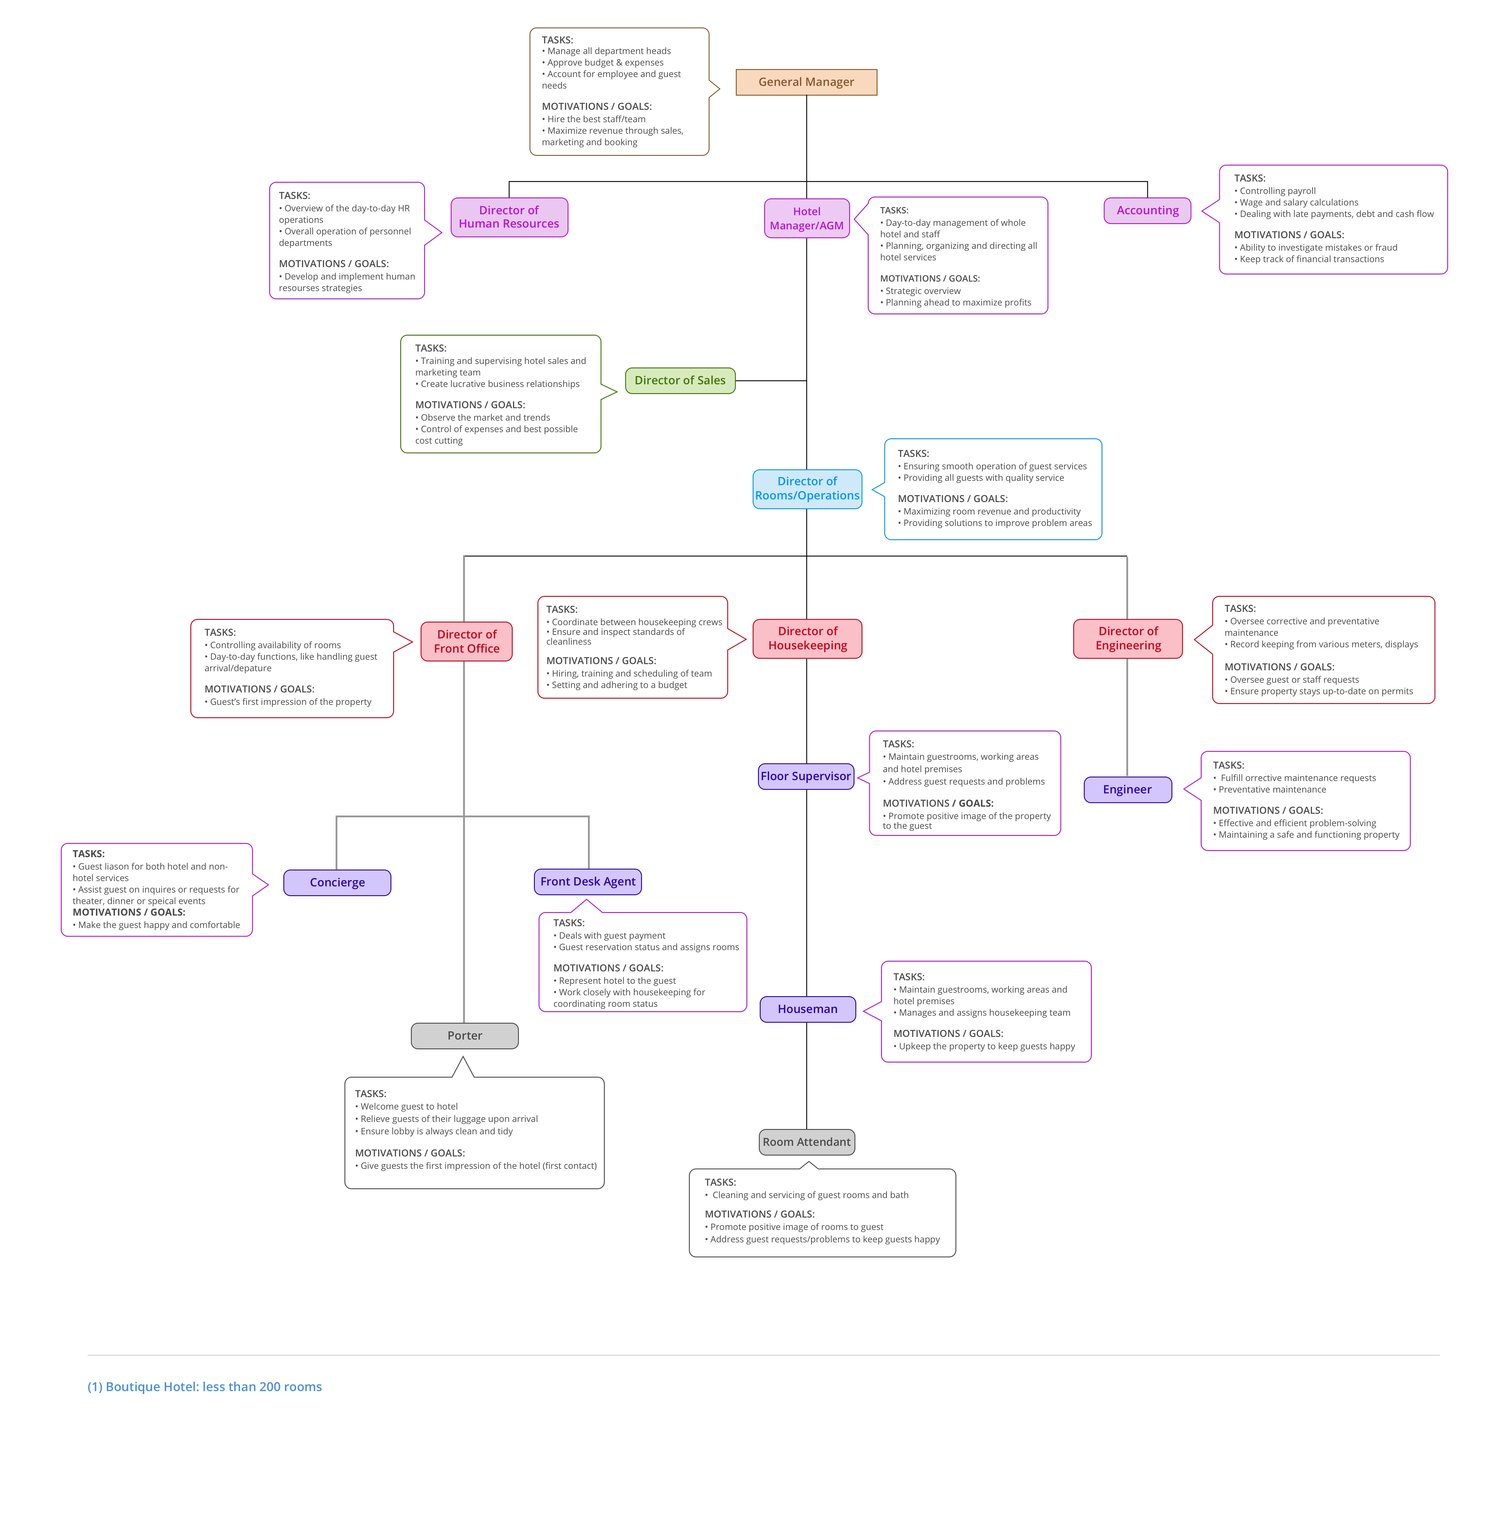 Org+Chart+updated+image.jpg